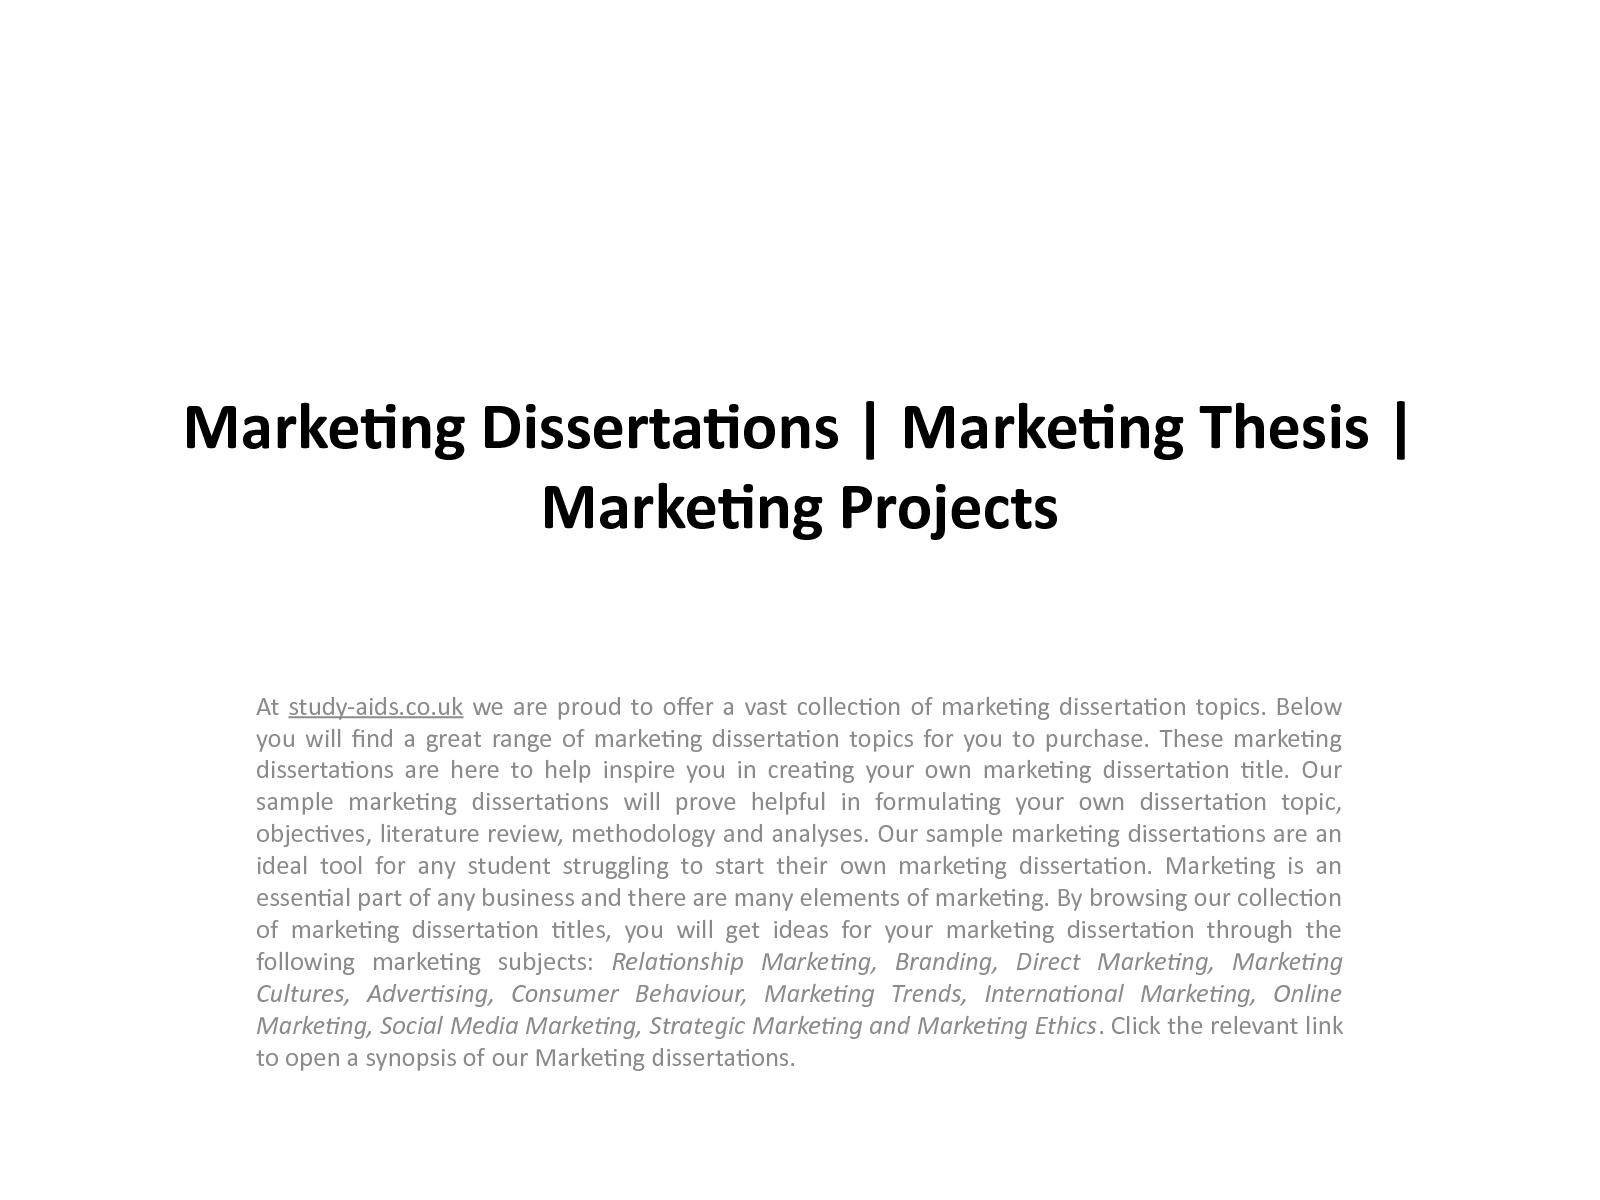 Marketing dissertations argumentative sample essay